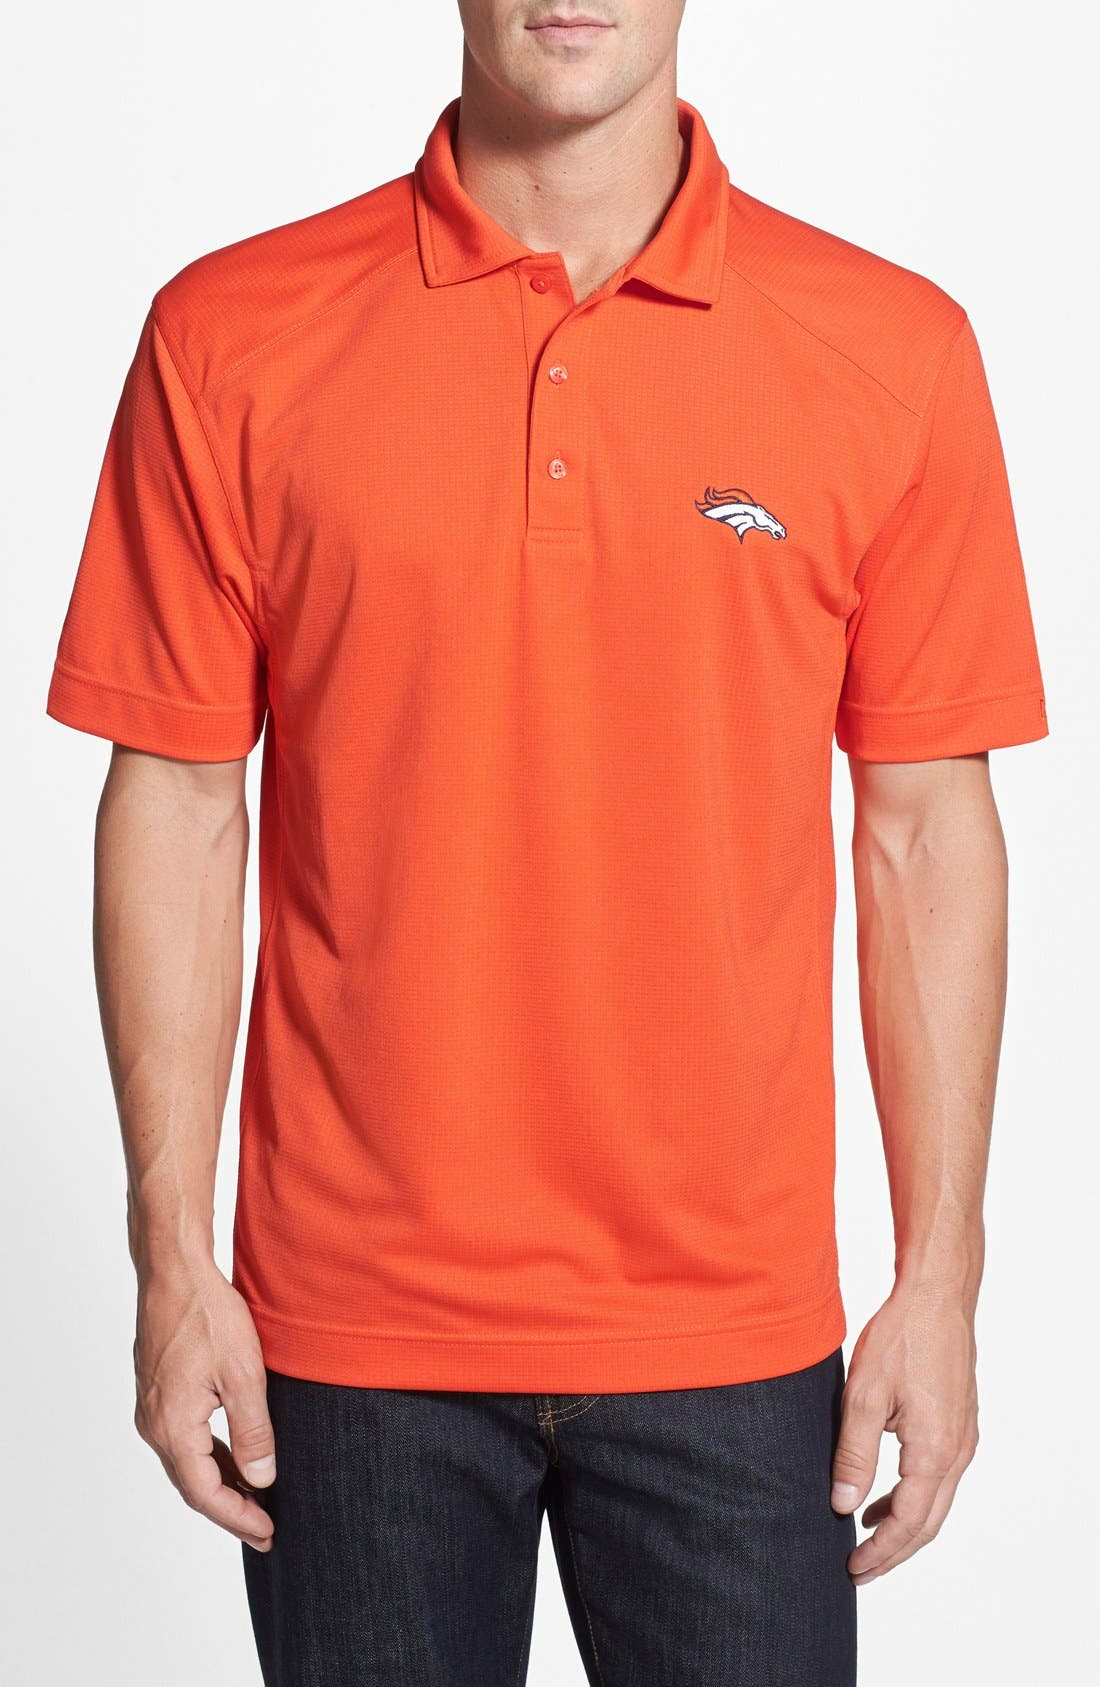 Cutter & Buck 'Denver Broncos - Genre' DryTec Moisture Wicking Polo (Big & Tall)